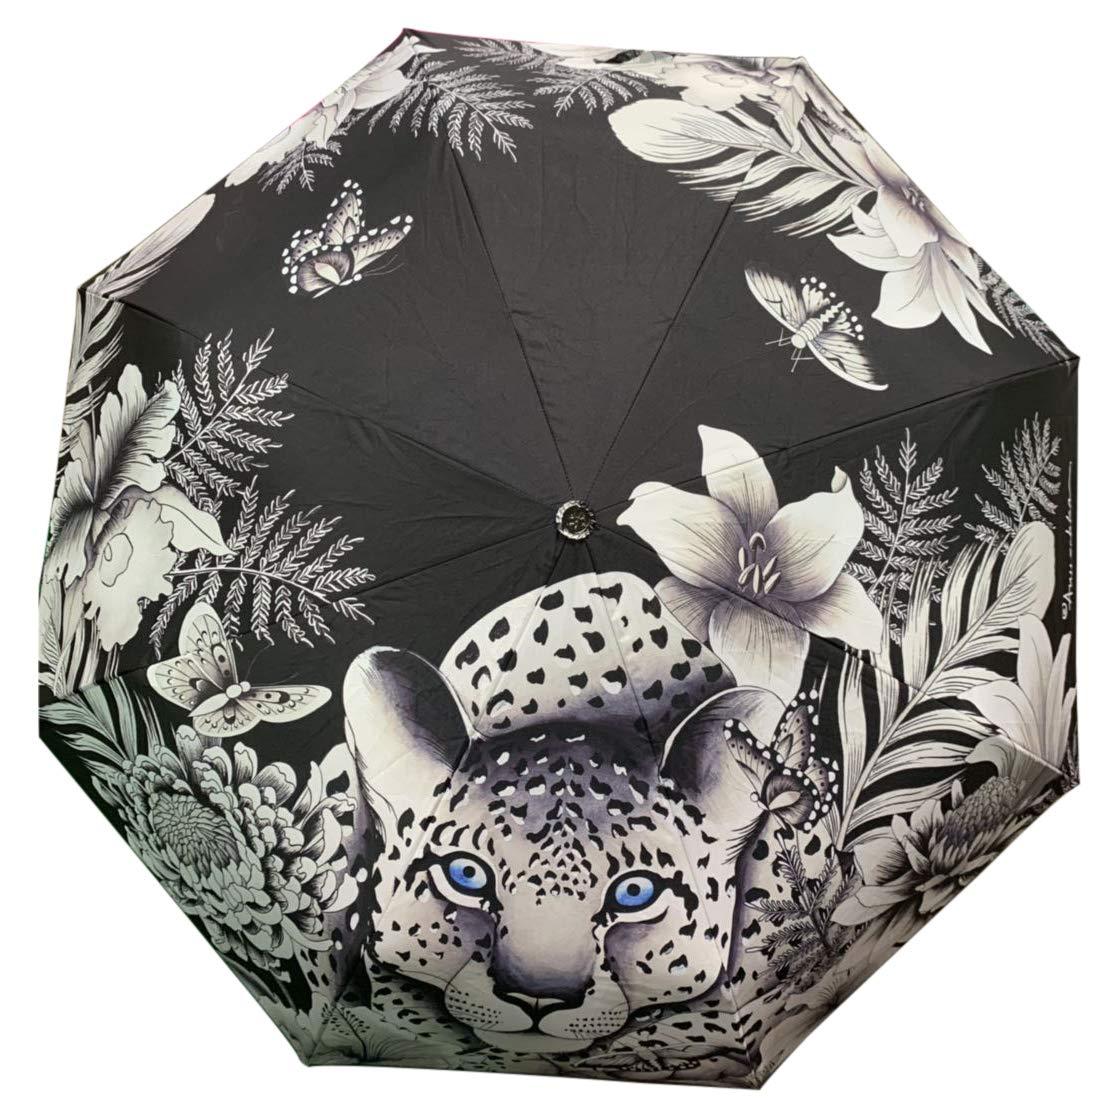 Anuschka Umbrella AUTO Open/Close | UPF 50+ Max Sun protection | 38'' Waterproof Canopy | Fits in Handbag | Windproof Flexible Fiberglass | Cleopatra's Leopard